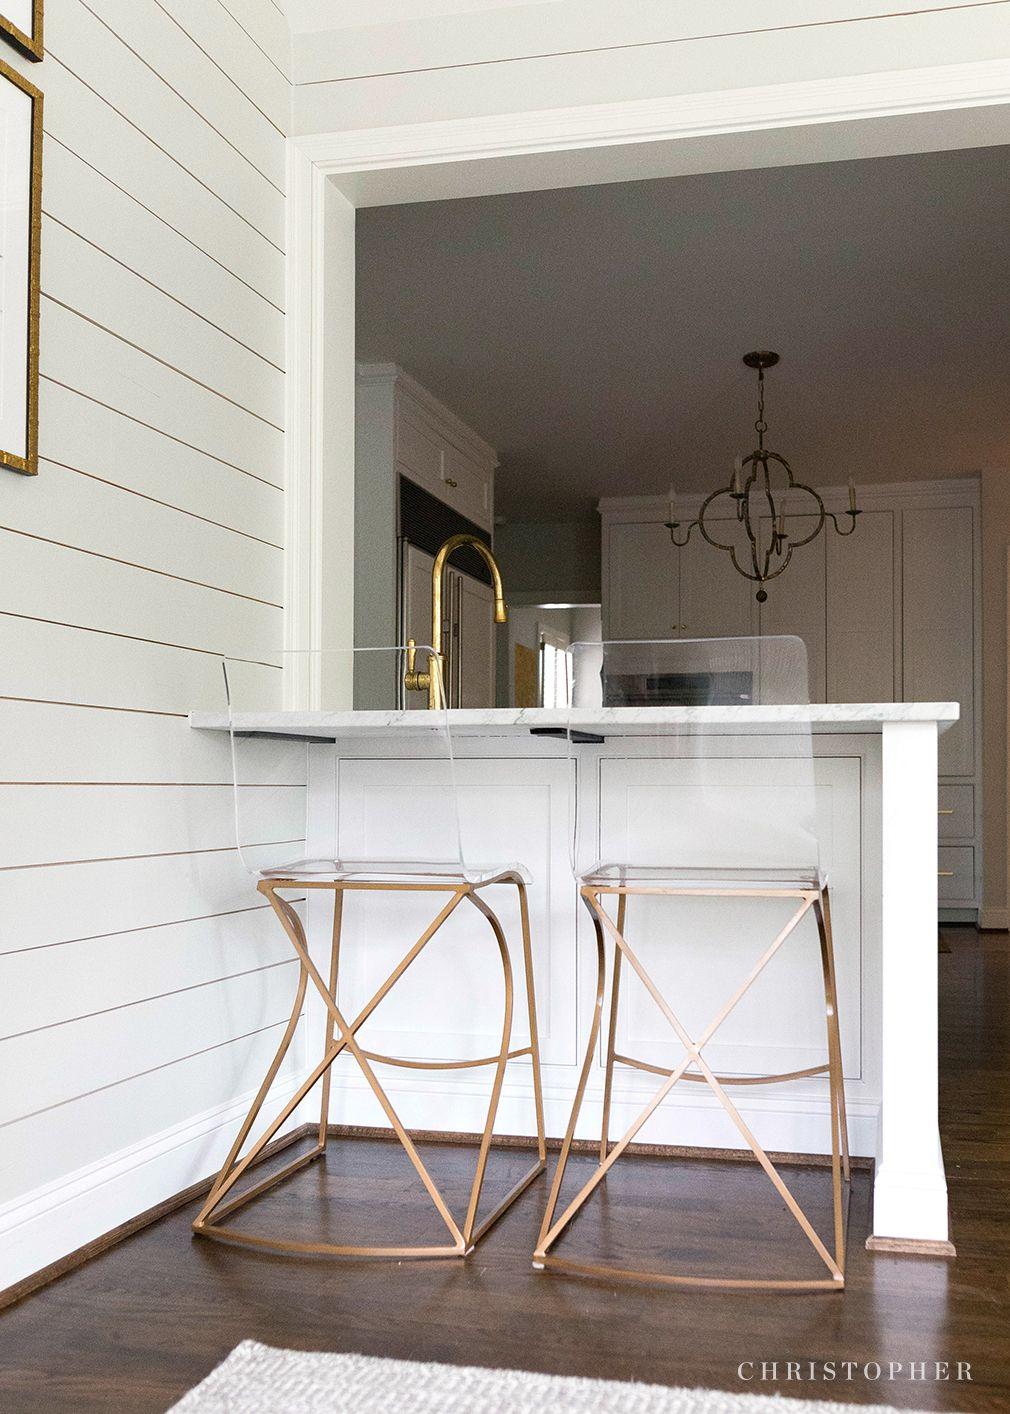 Miraculous Christopher Gold And Clear Acrylic Counter Stools Inzonedesignstudio Interior Chair Design Inzonedesignstudiocom